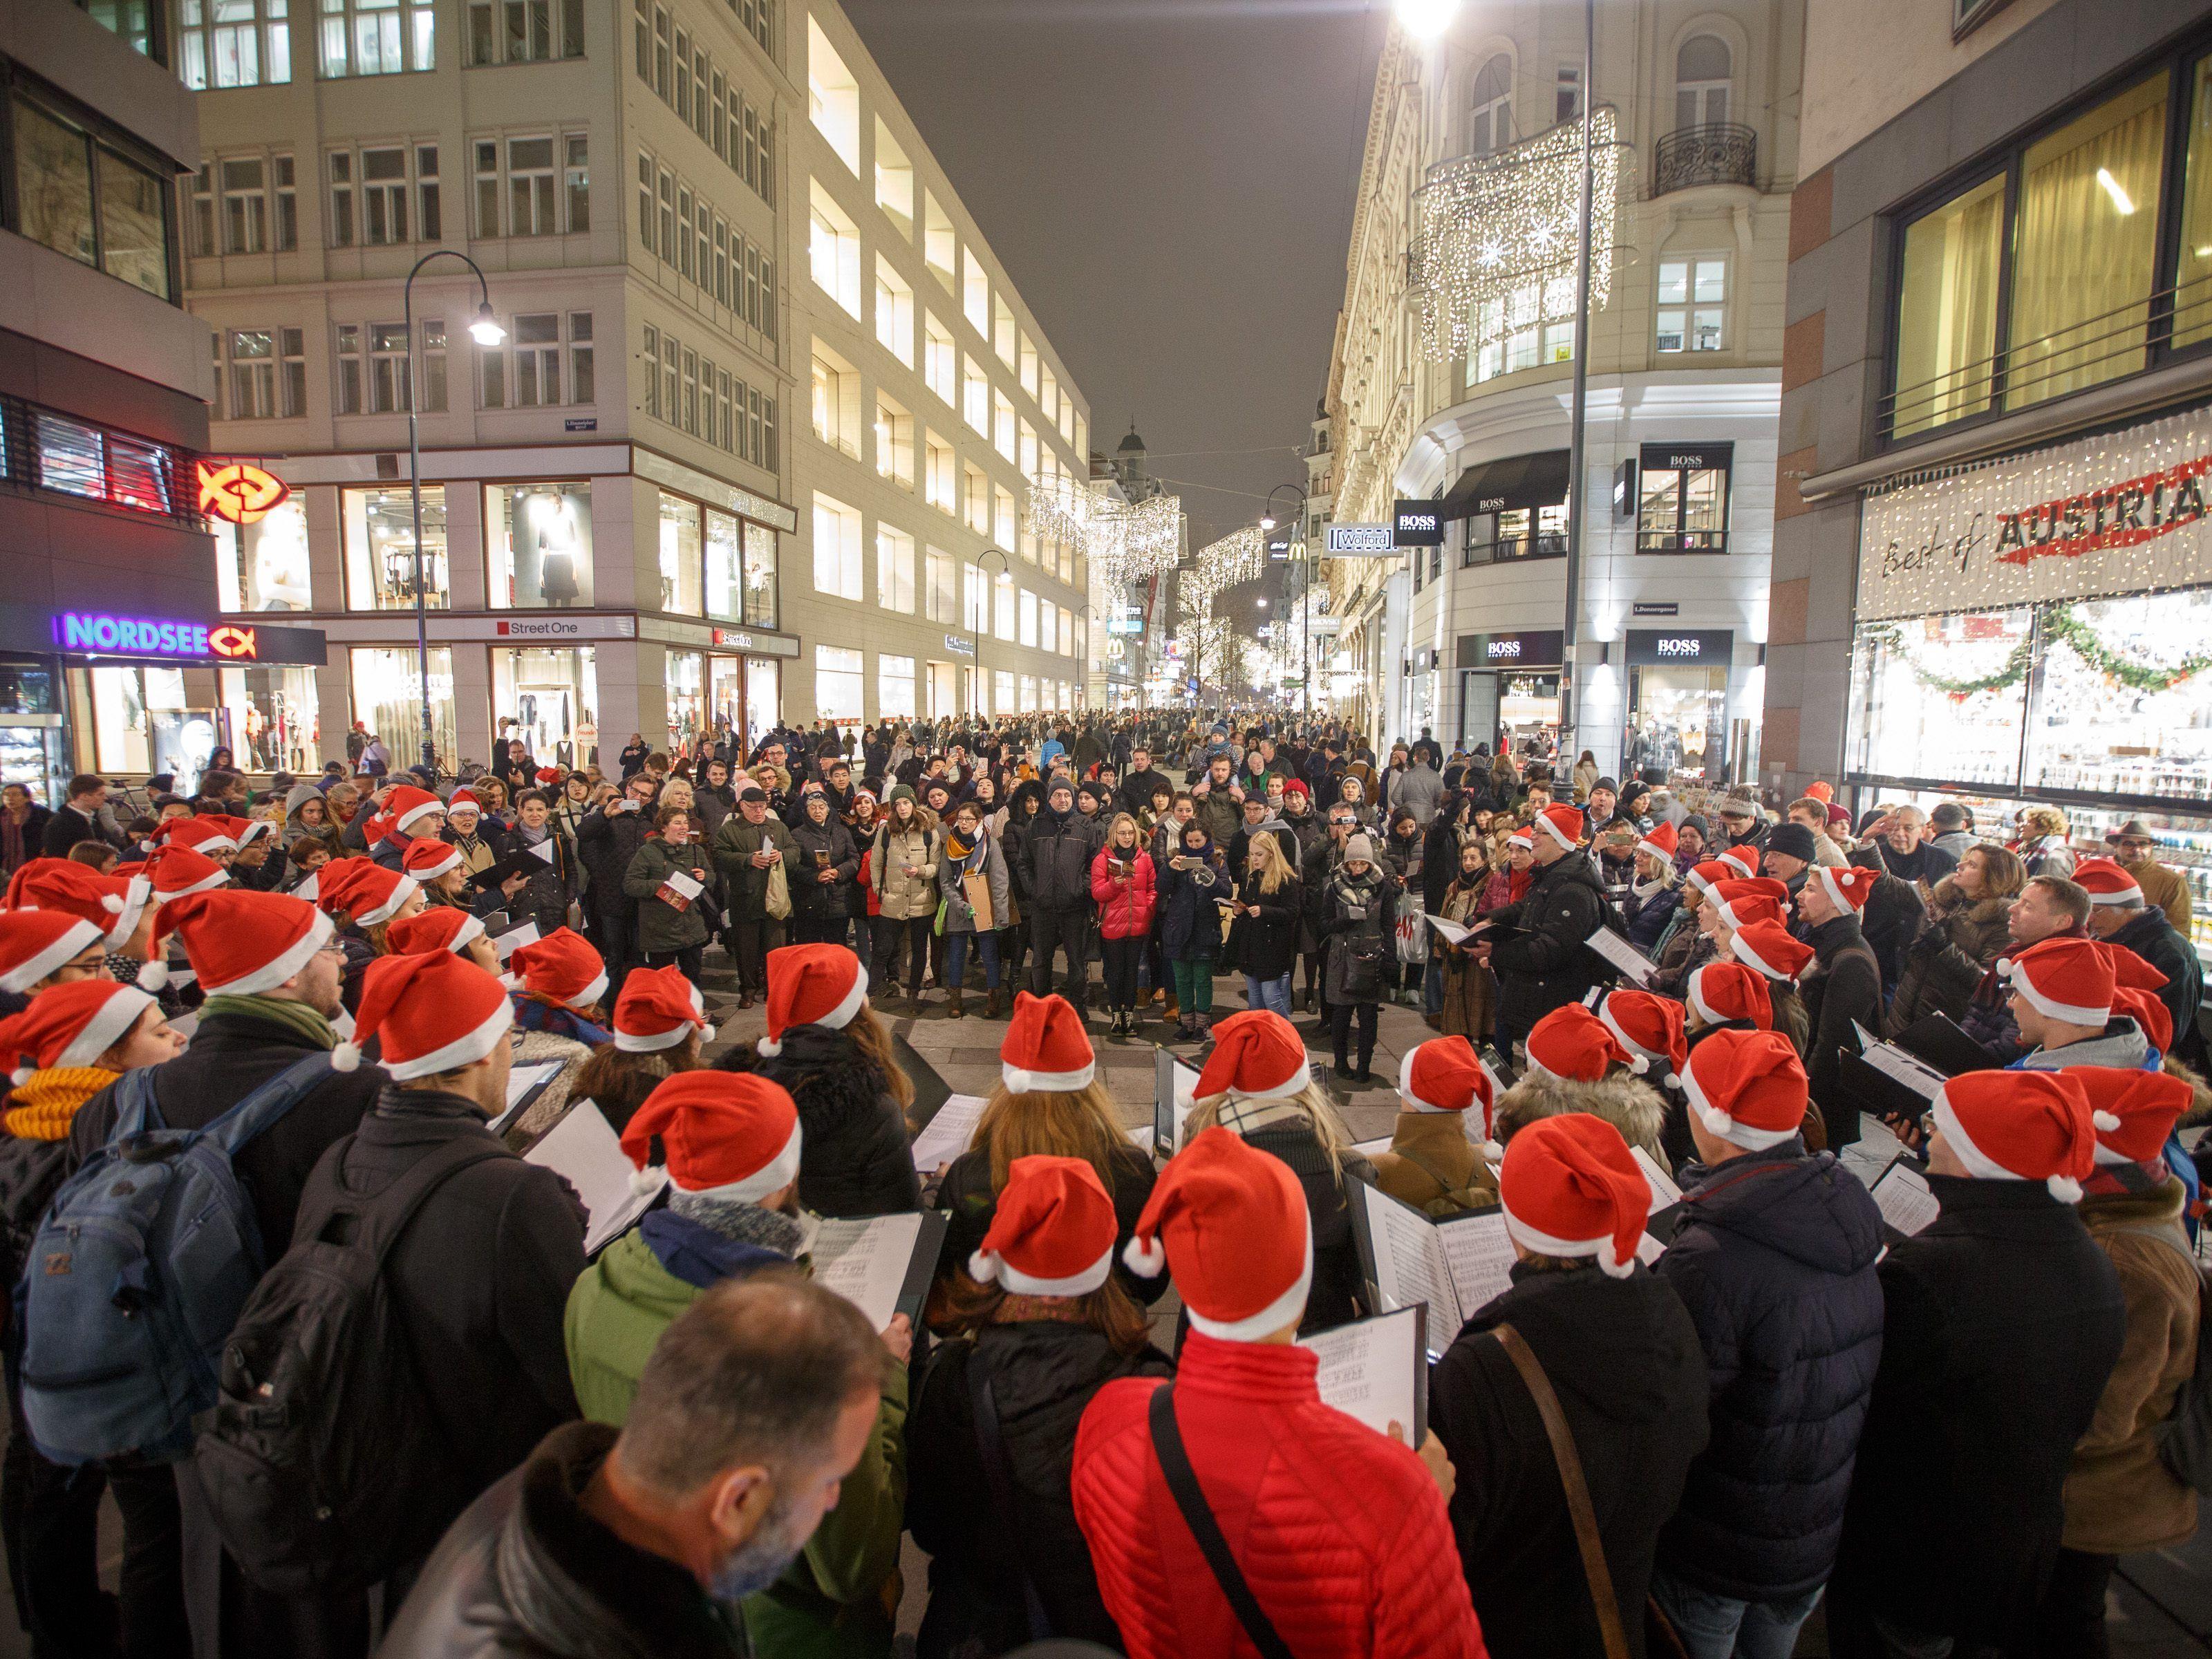 Wann Weihnachtsbeleuchtung.Wiener Weihnachtsbeleuchtung Wird Am 17 November Eingeschaltet